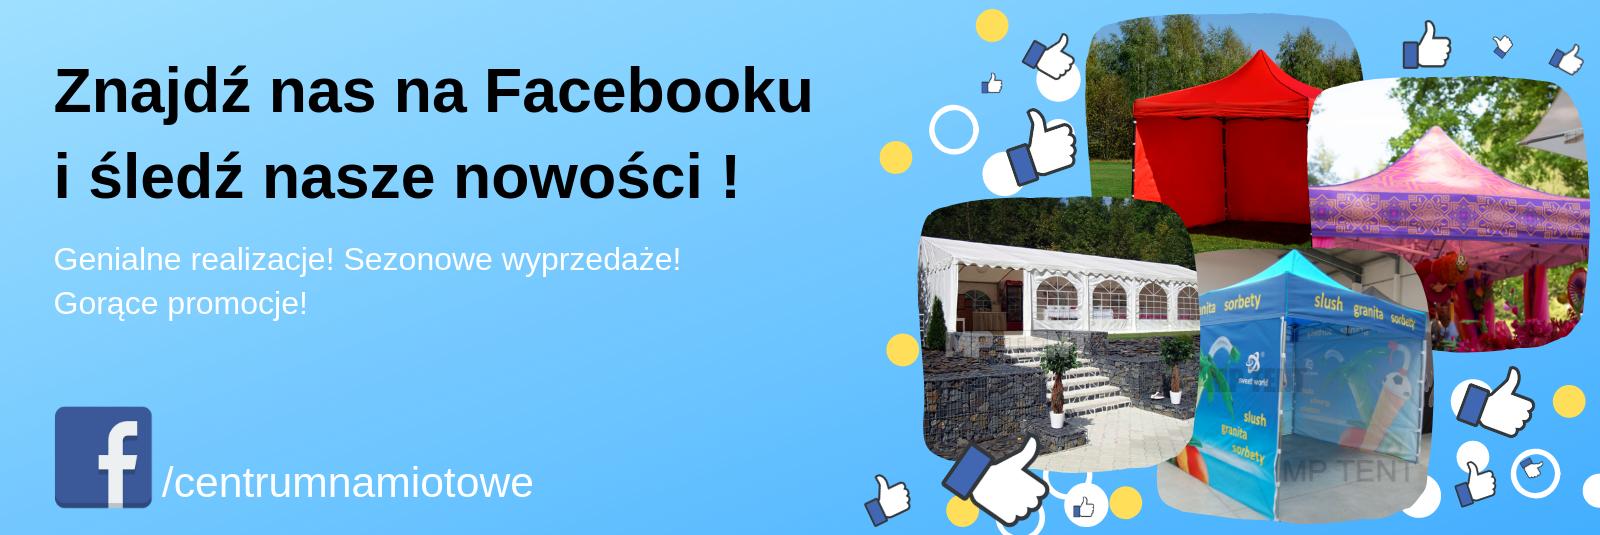 Śledź nas na facebooku !